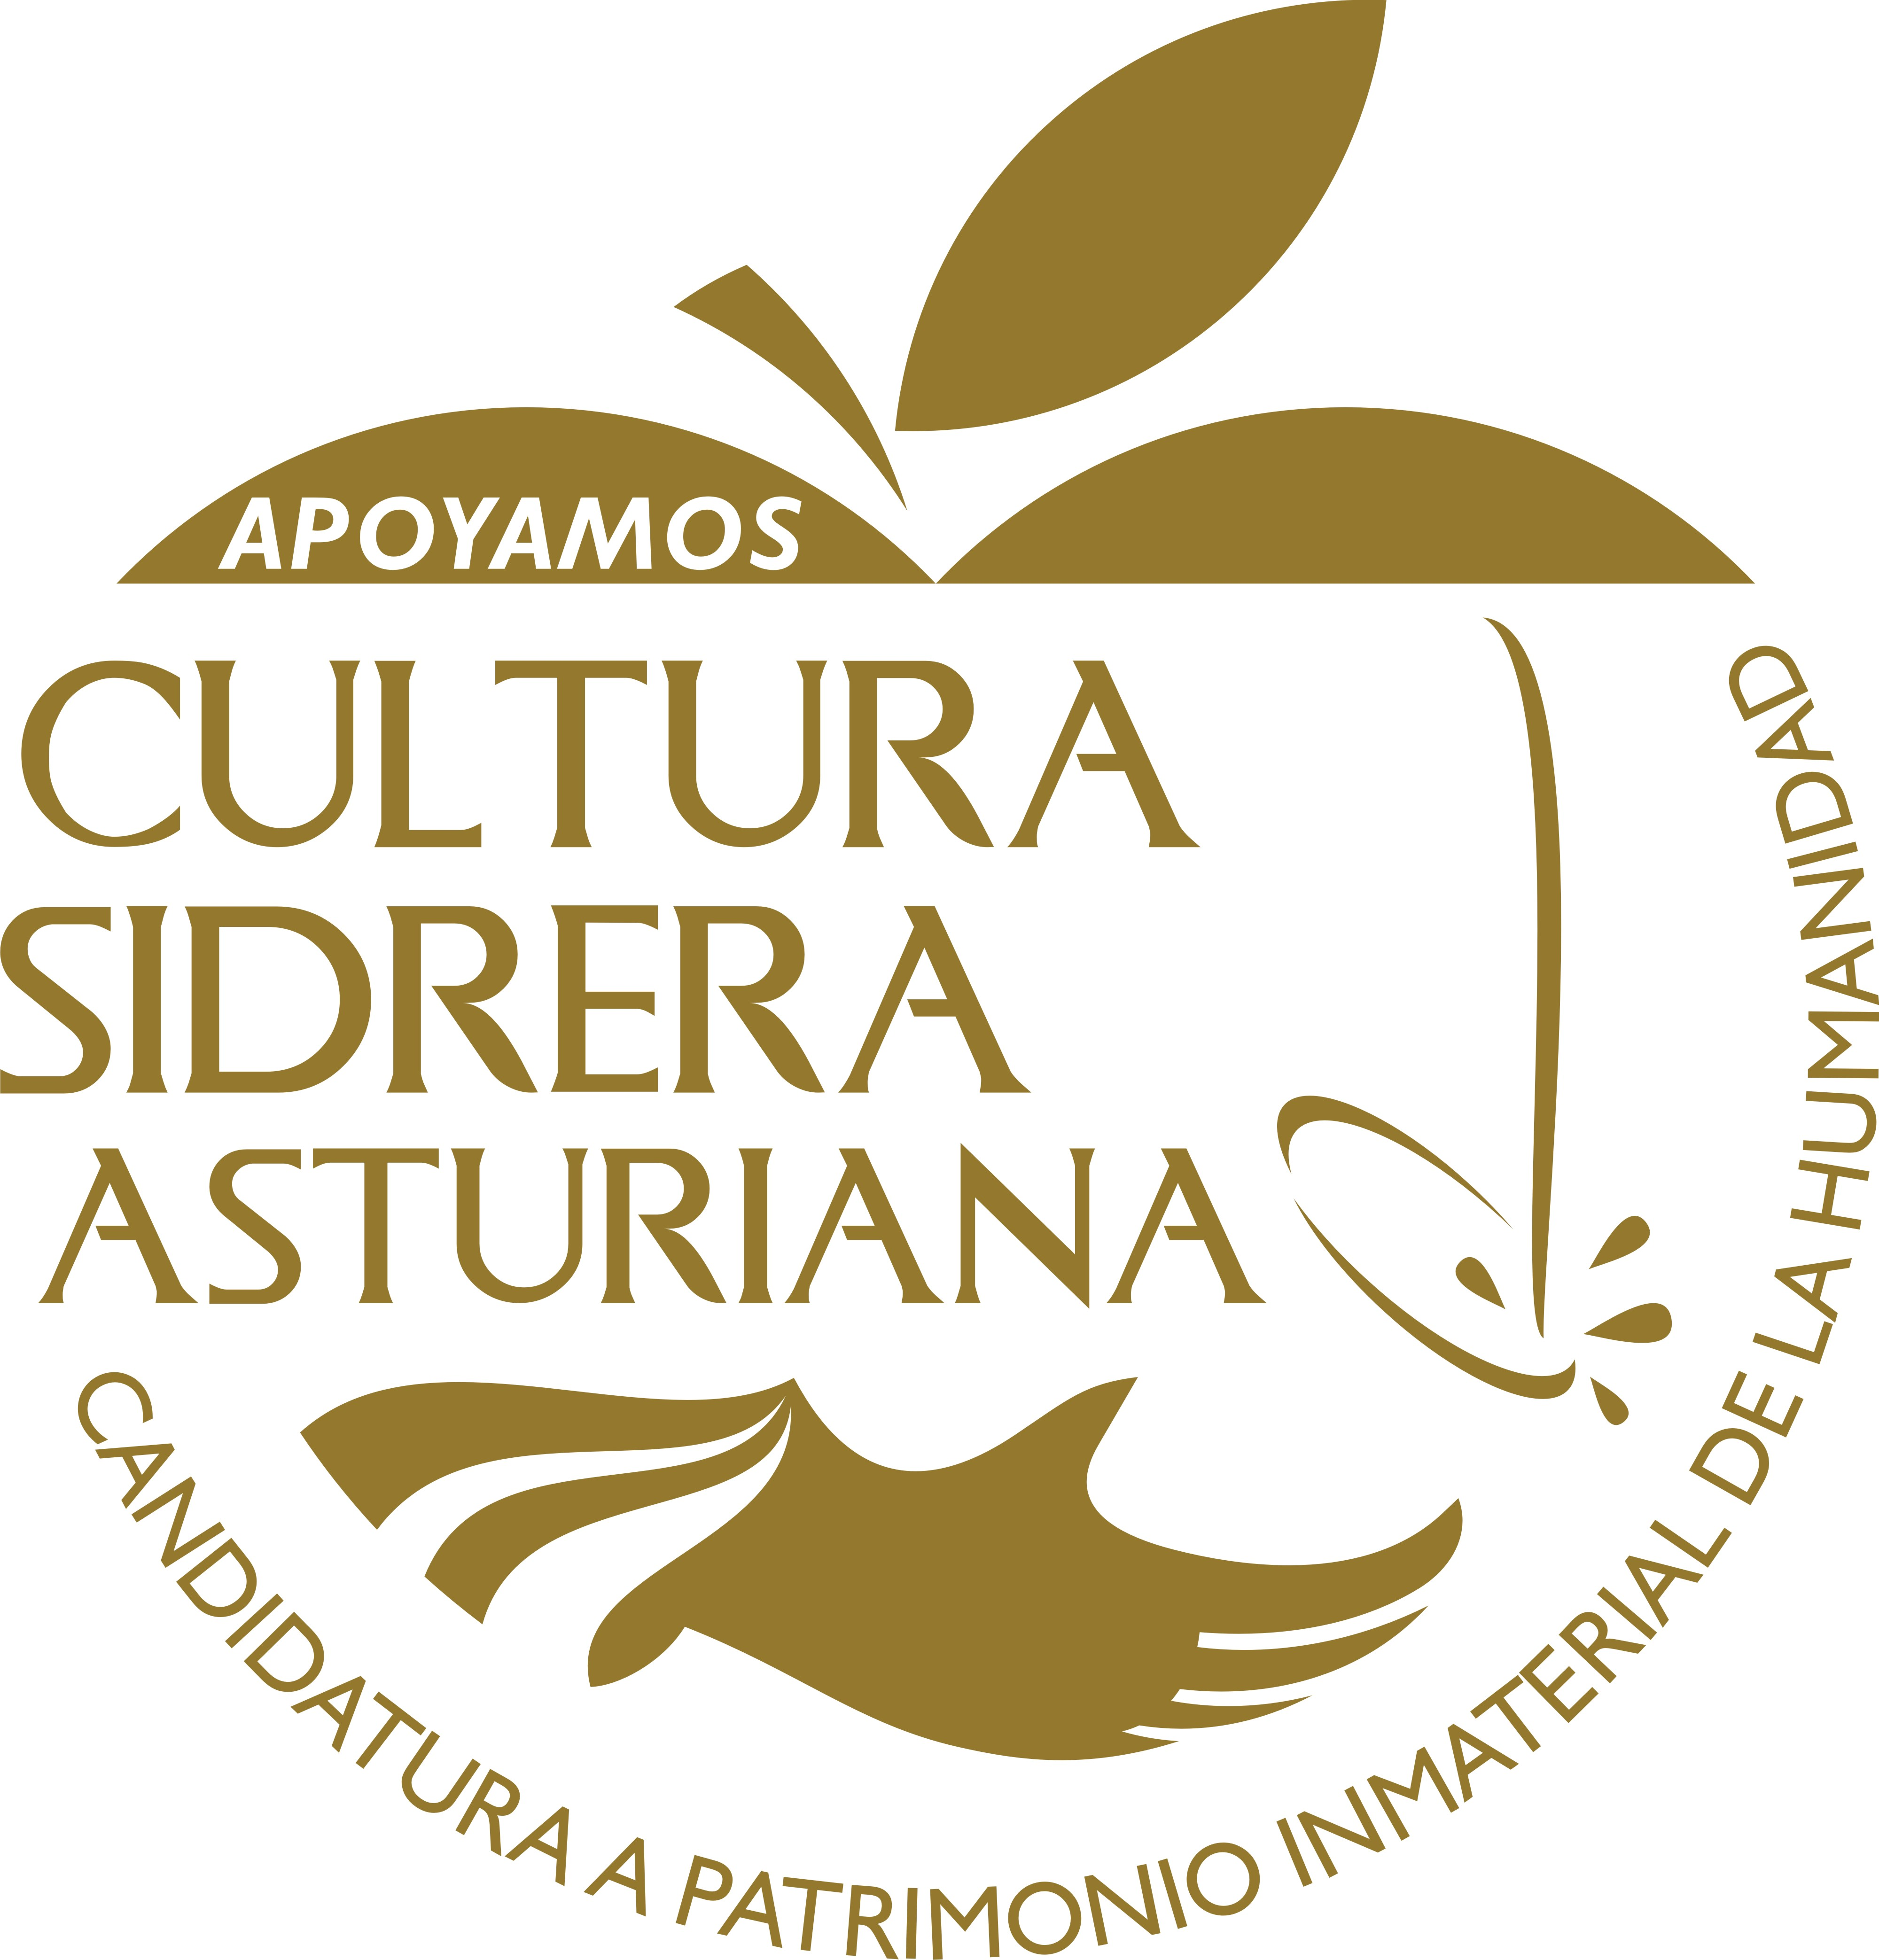 Cultura sidrera asturiana